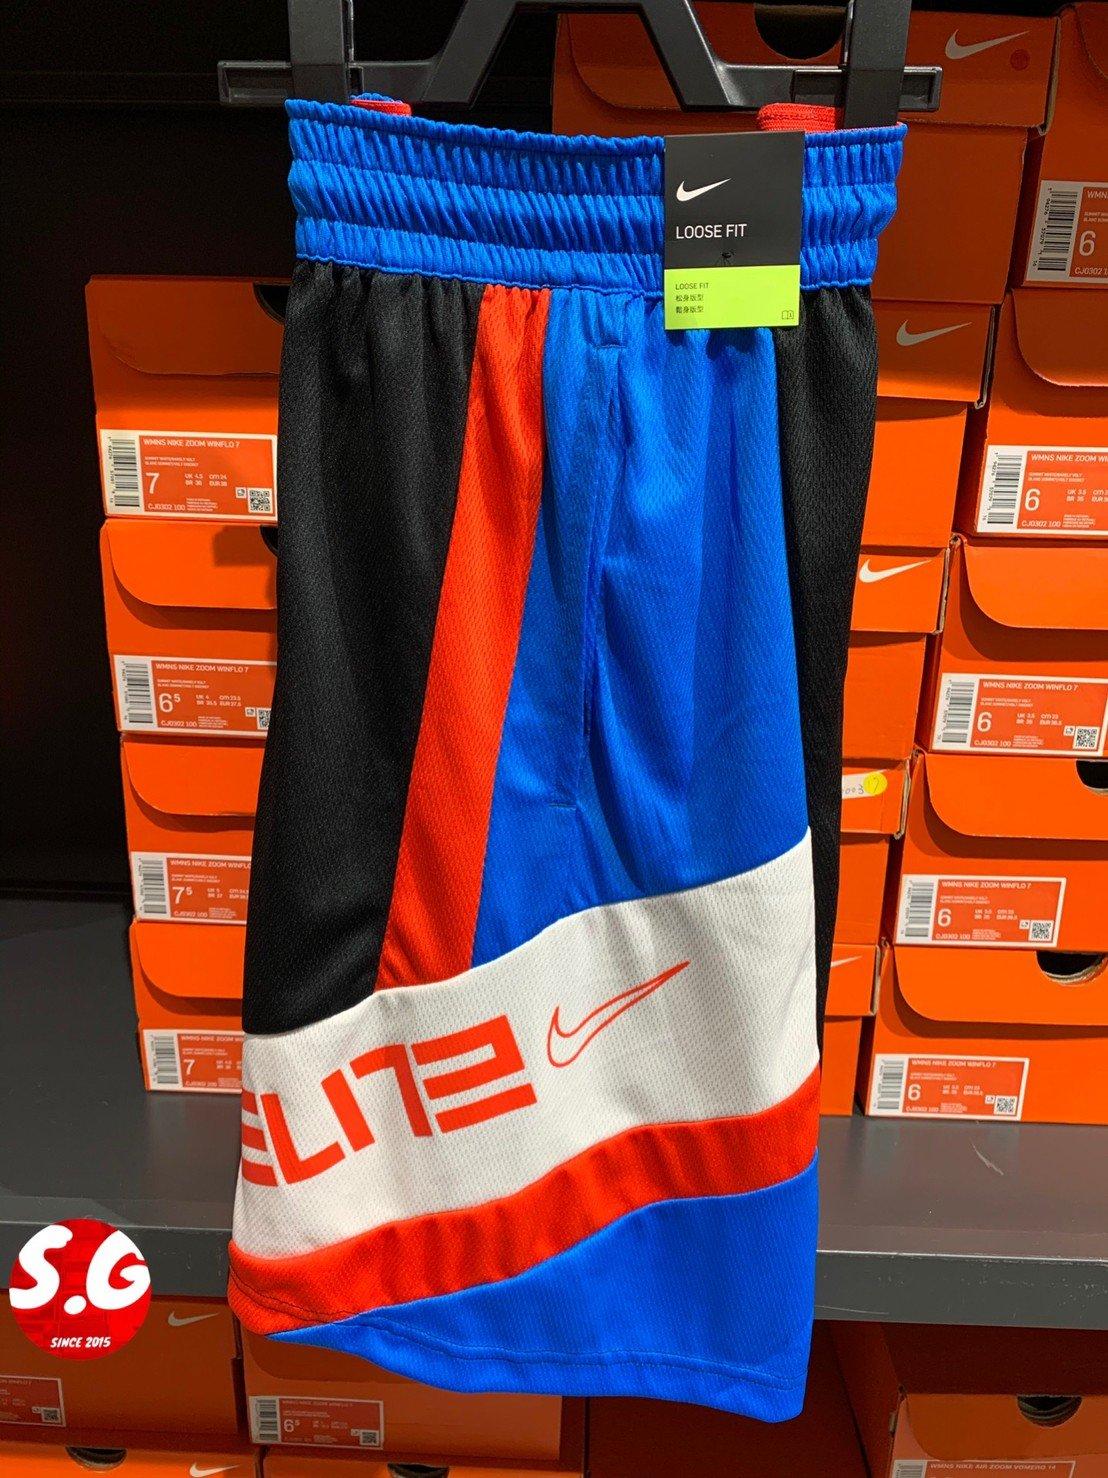 S.G NIKE DRY ELITE 黑色 抽繩 鬆緊帶 球褲 籃球褲 運動短褲 透氣 排汗 男生 BV9382-013